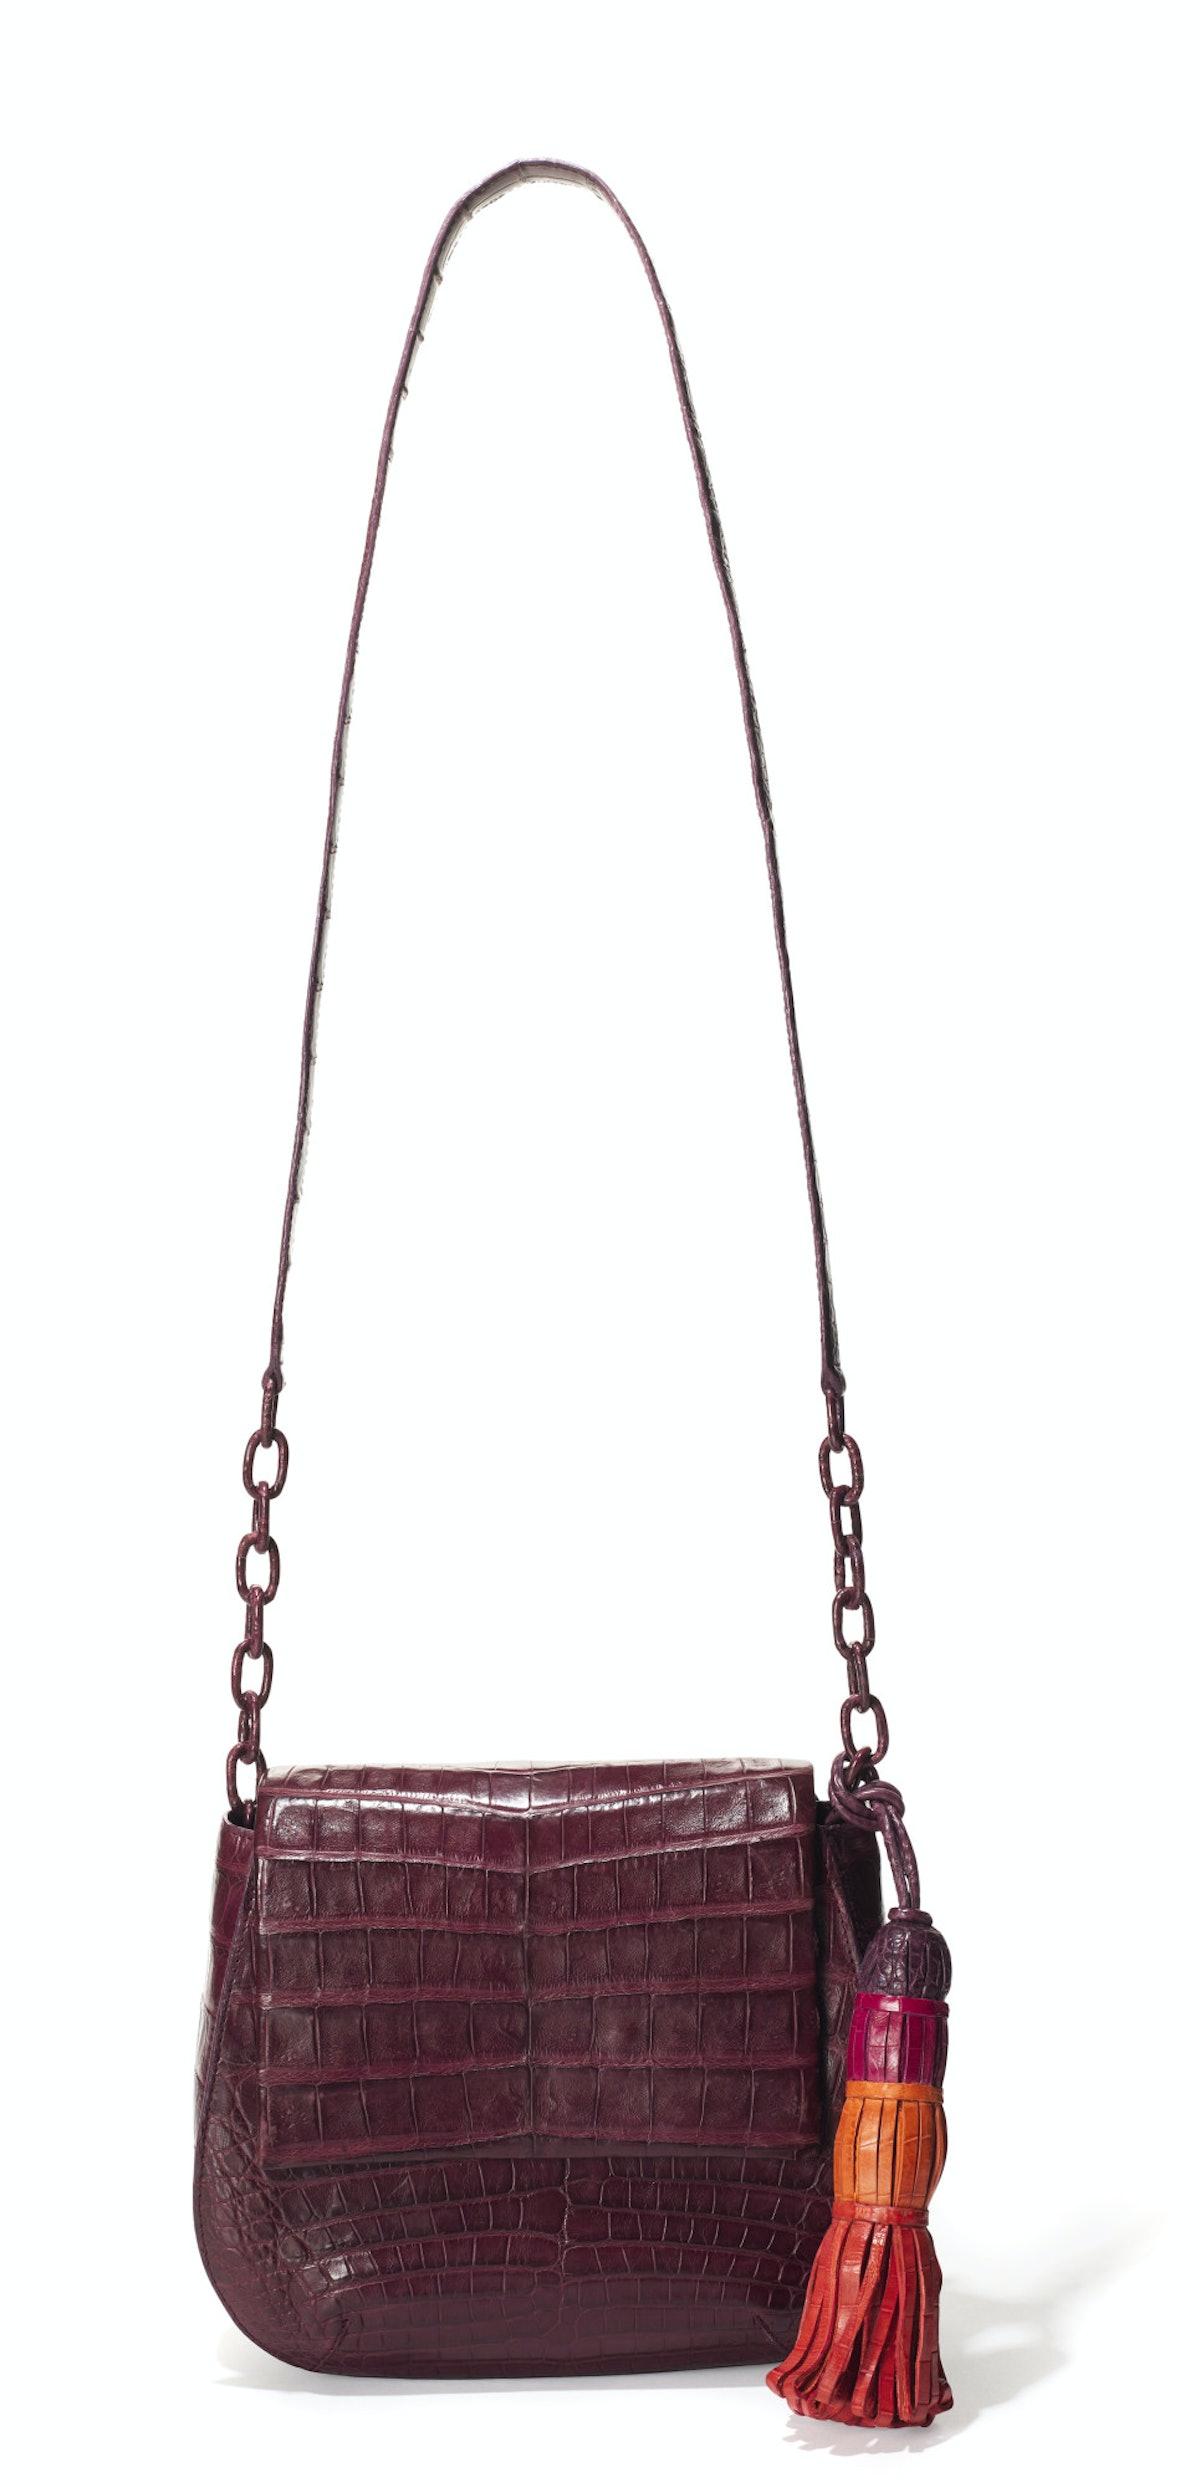 Nancy Gonzalez bag